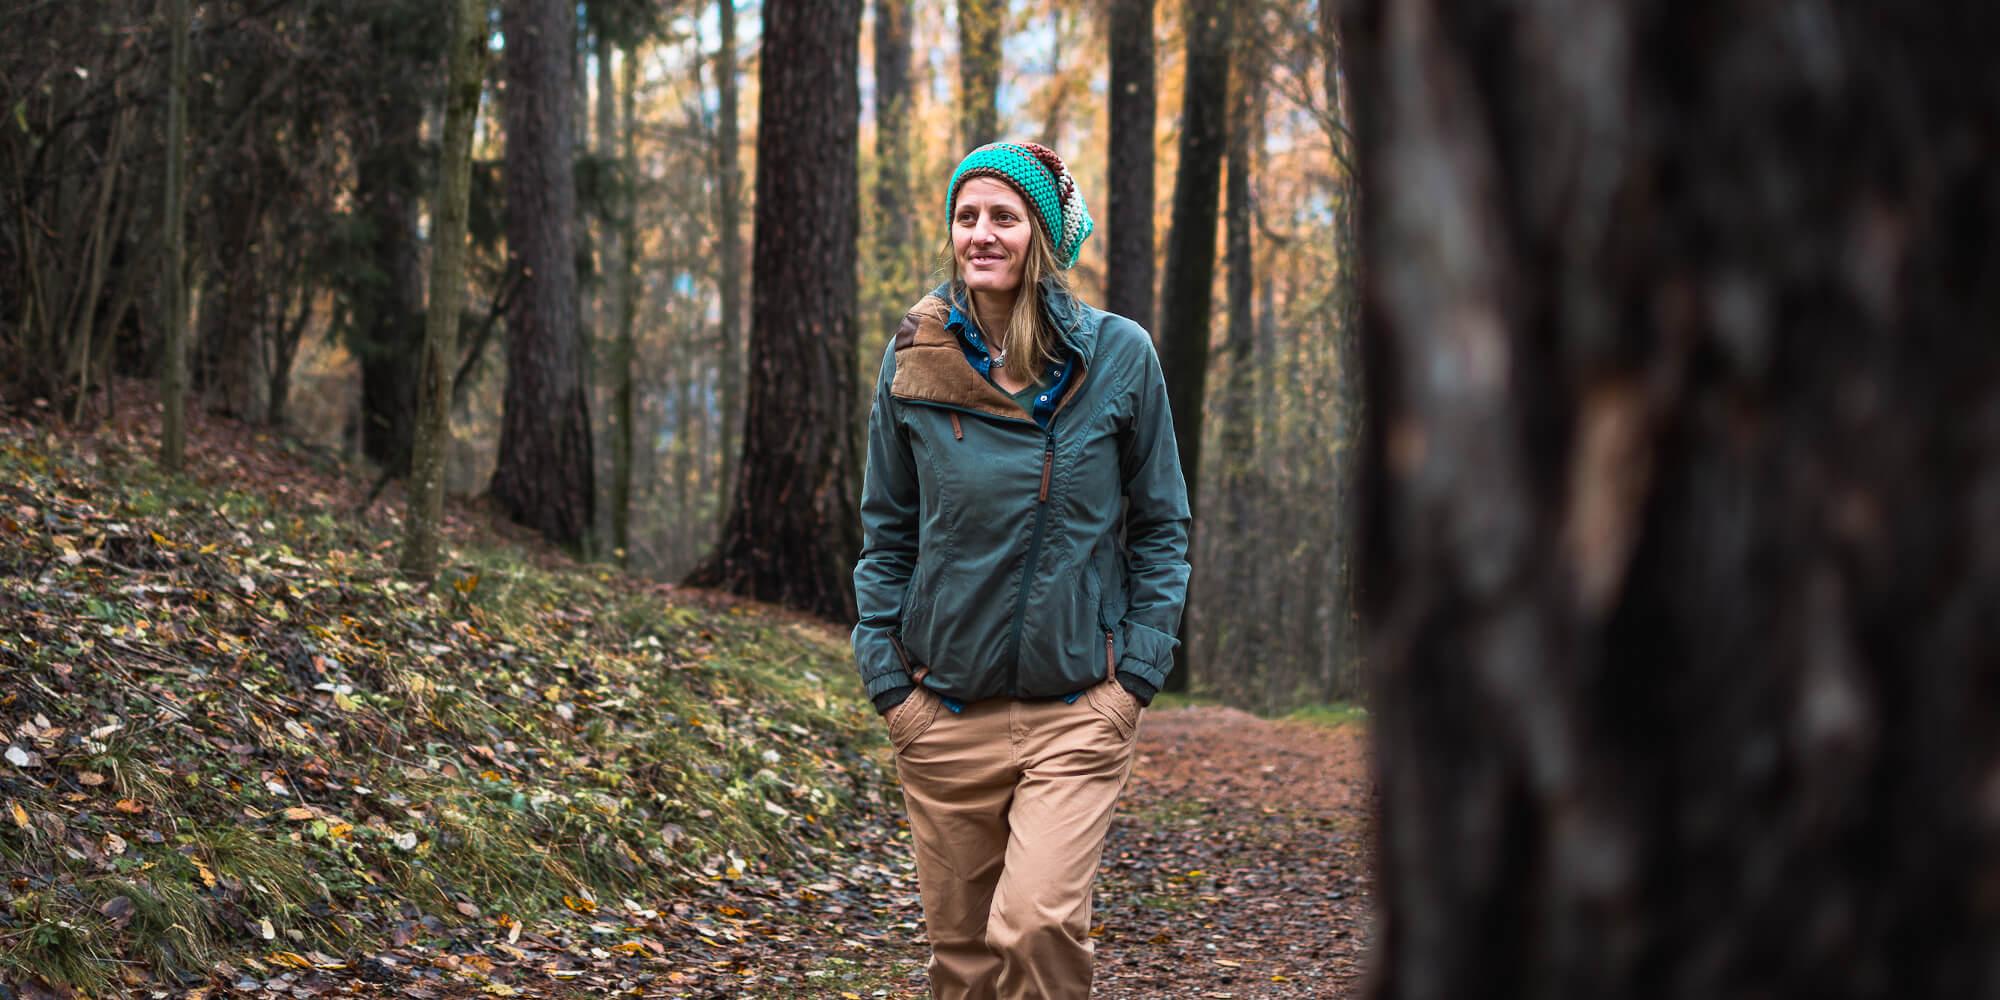 Maggy Gschnitzer im Wald